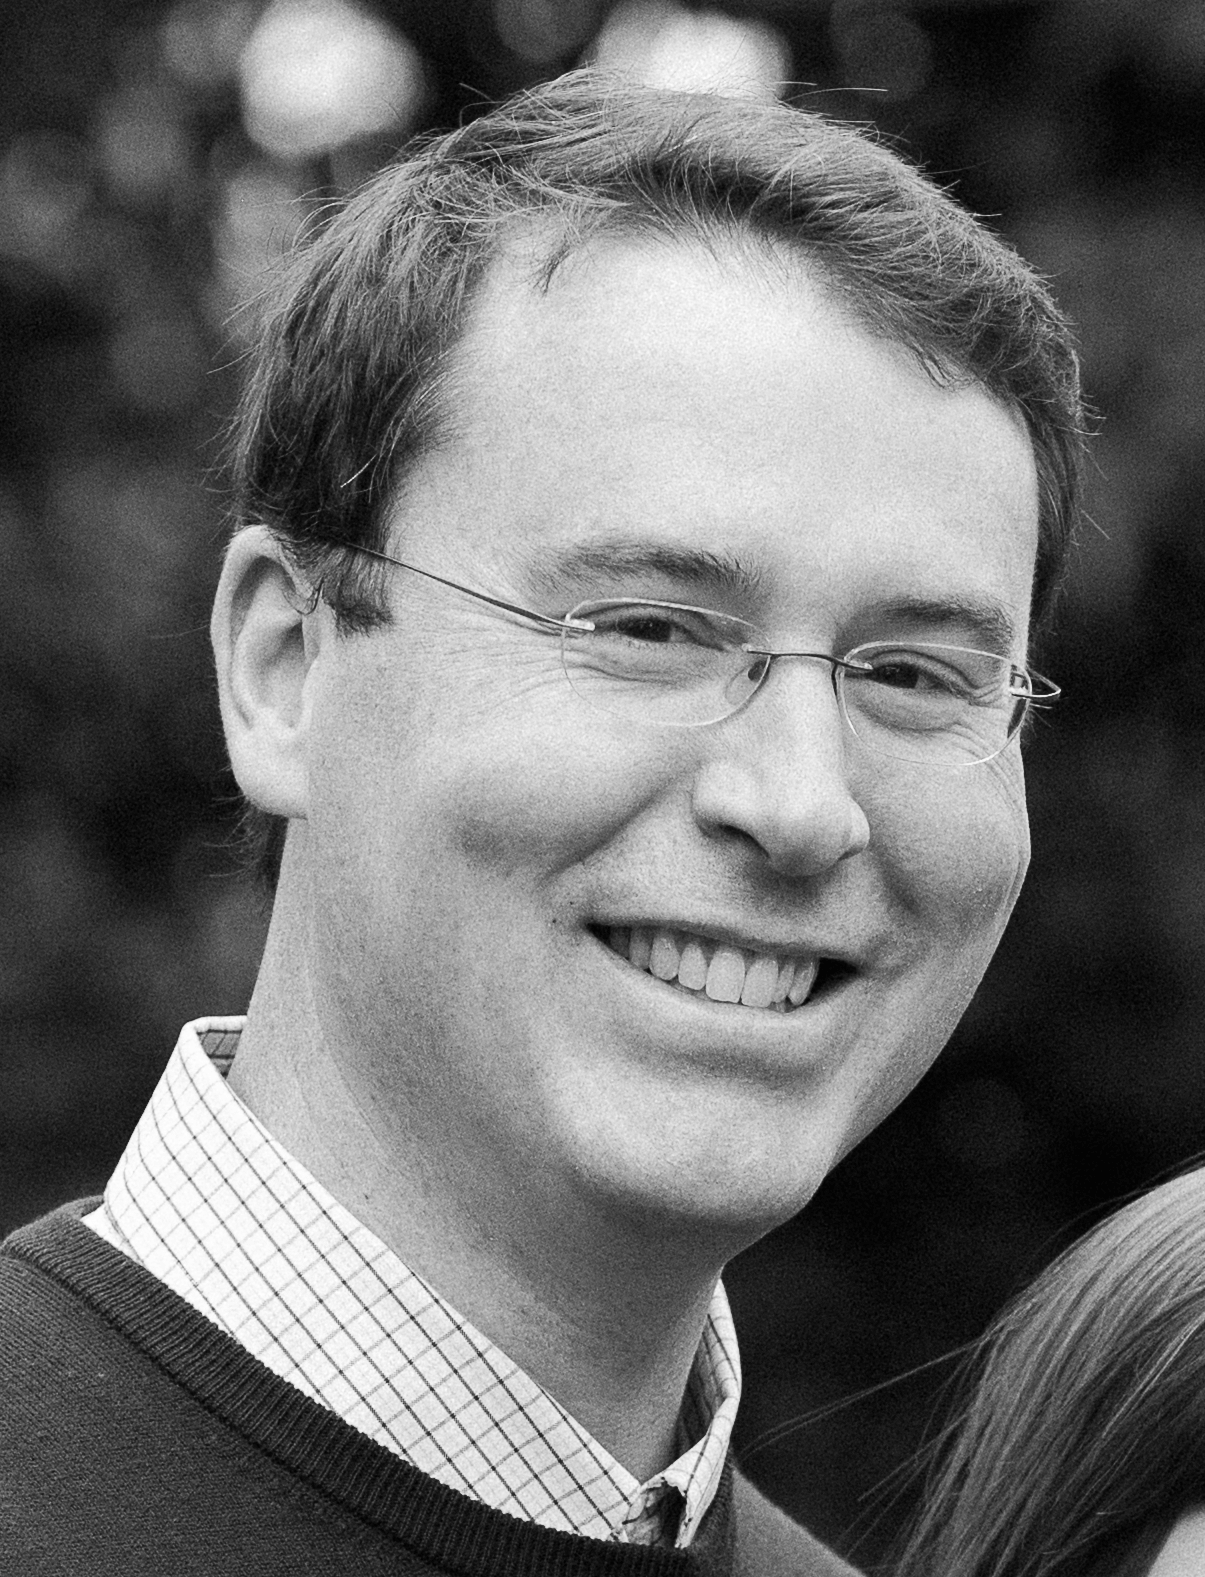 James Branigan